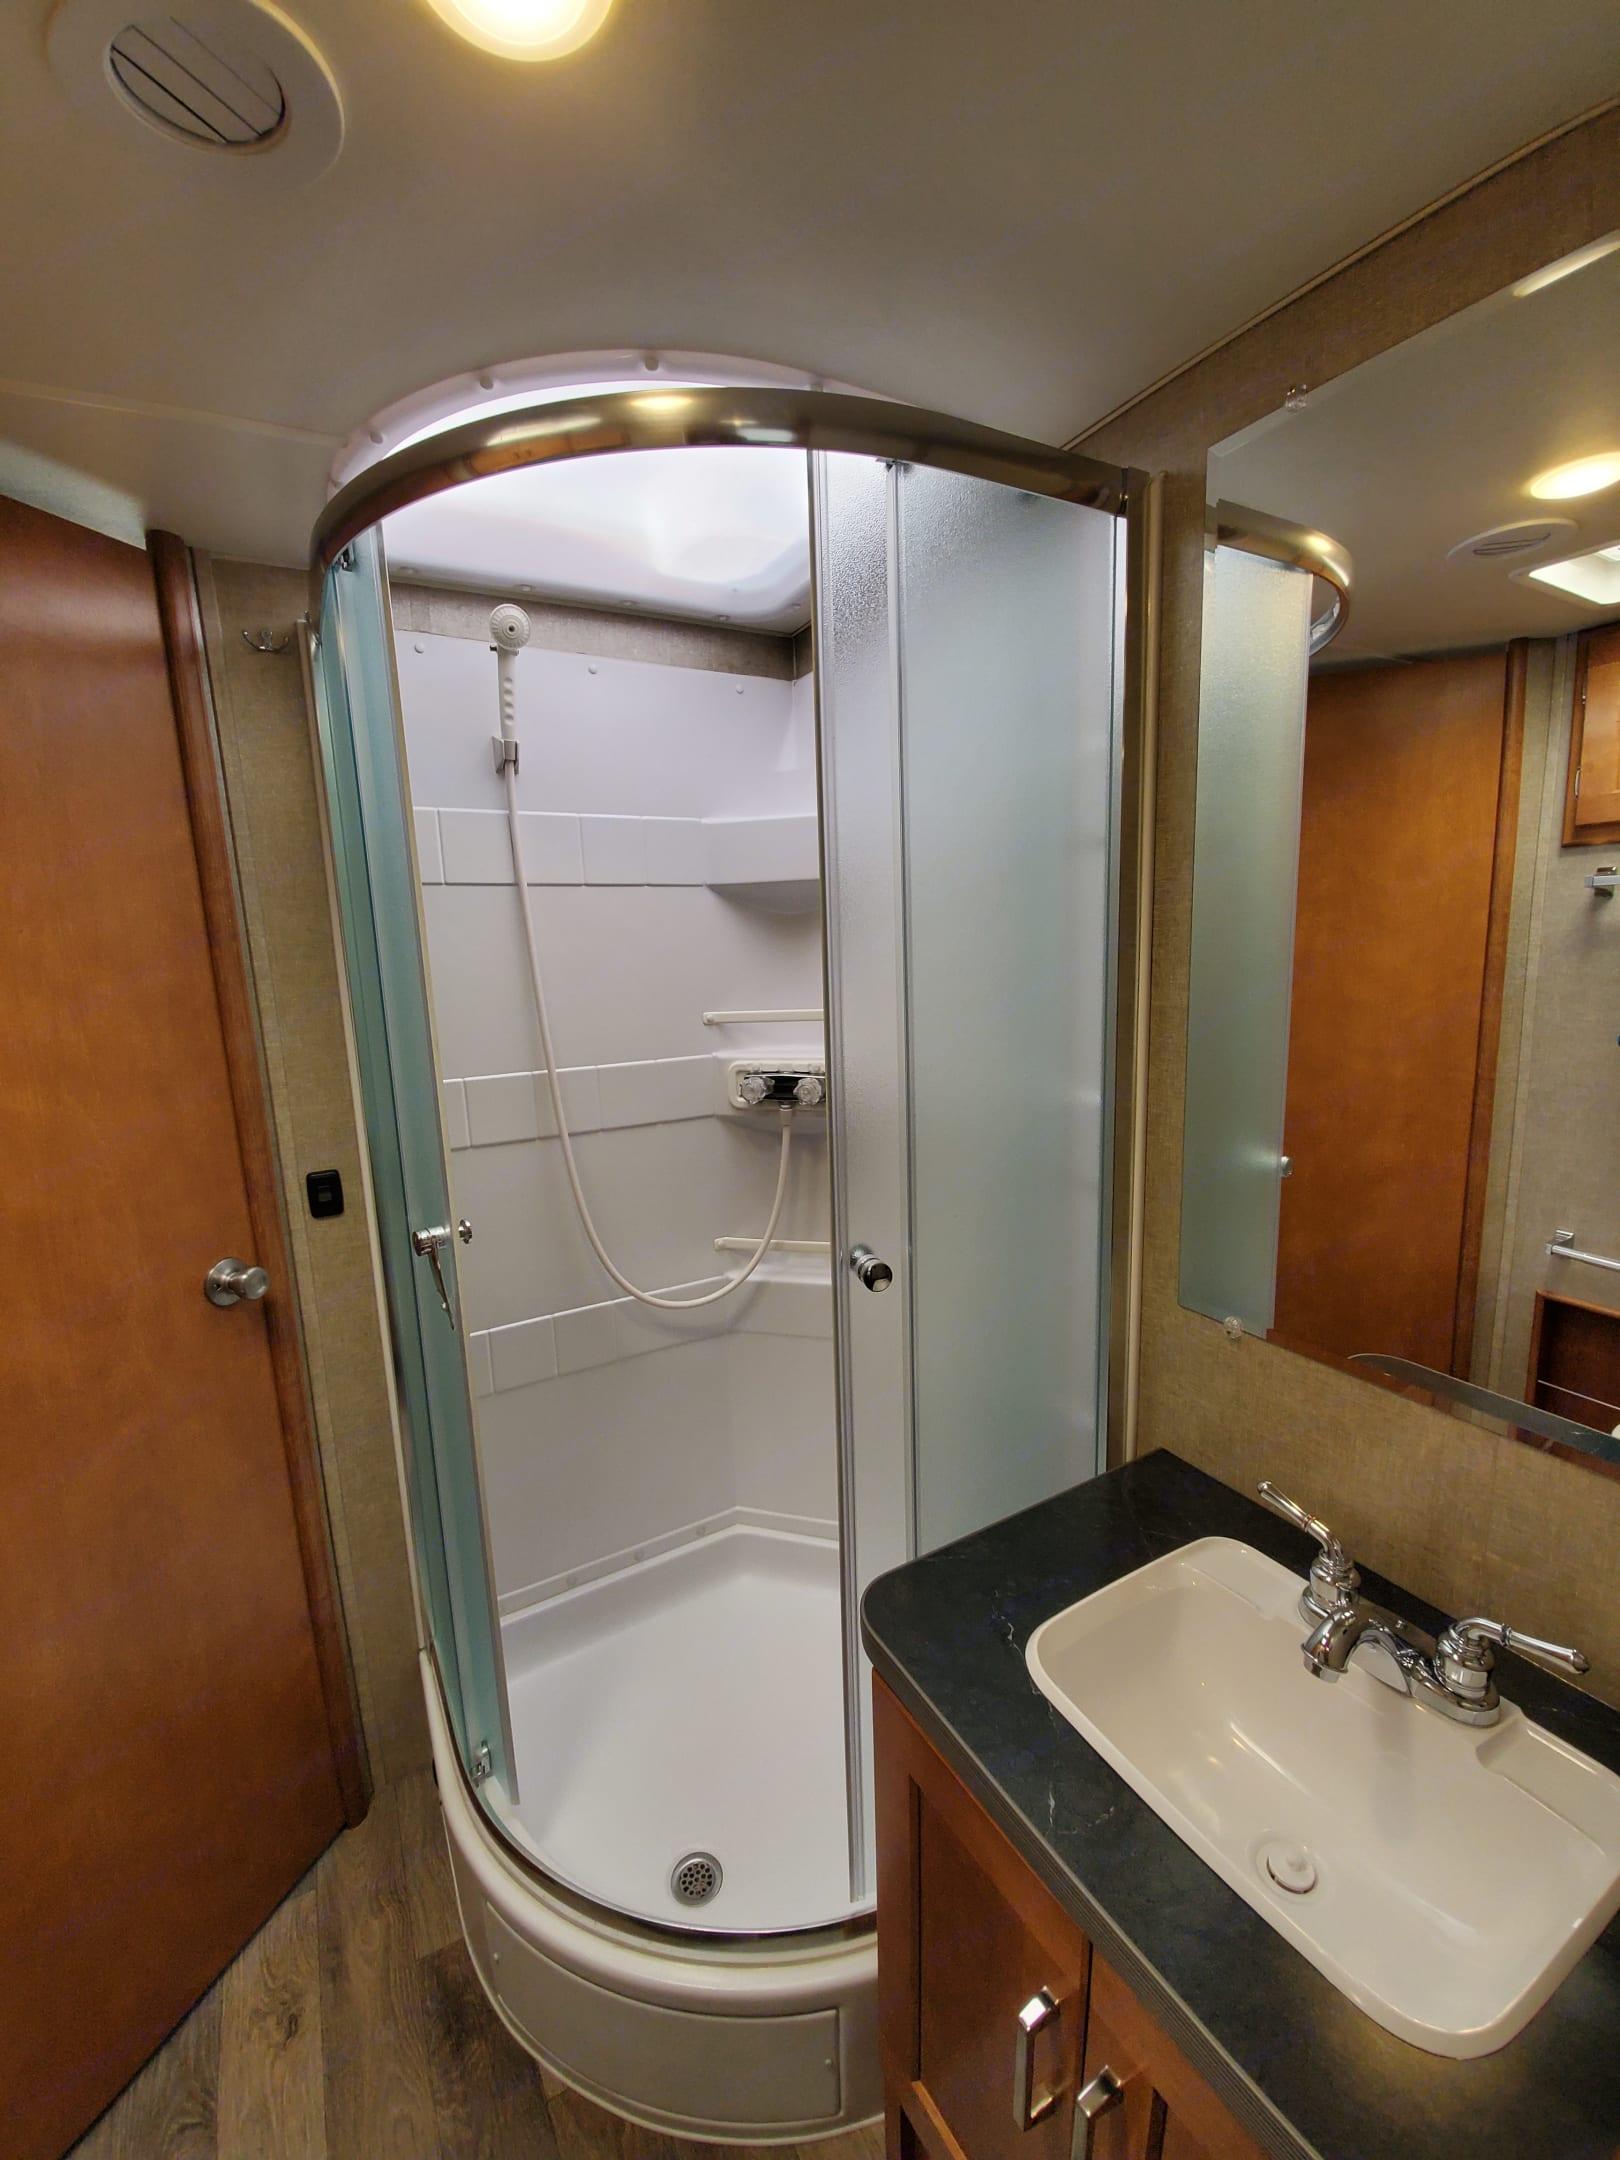 bathroom with hot and cold water. Winnebago Minnie Winnie 2019